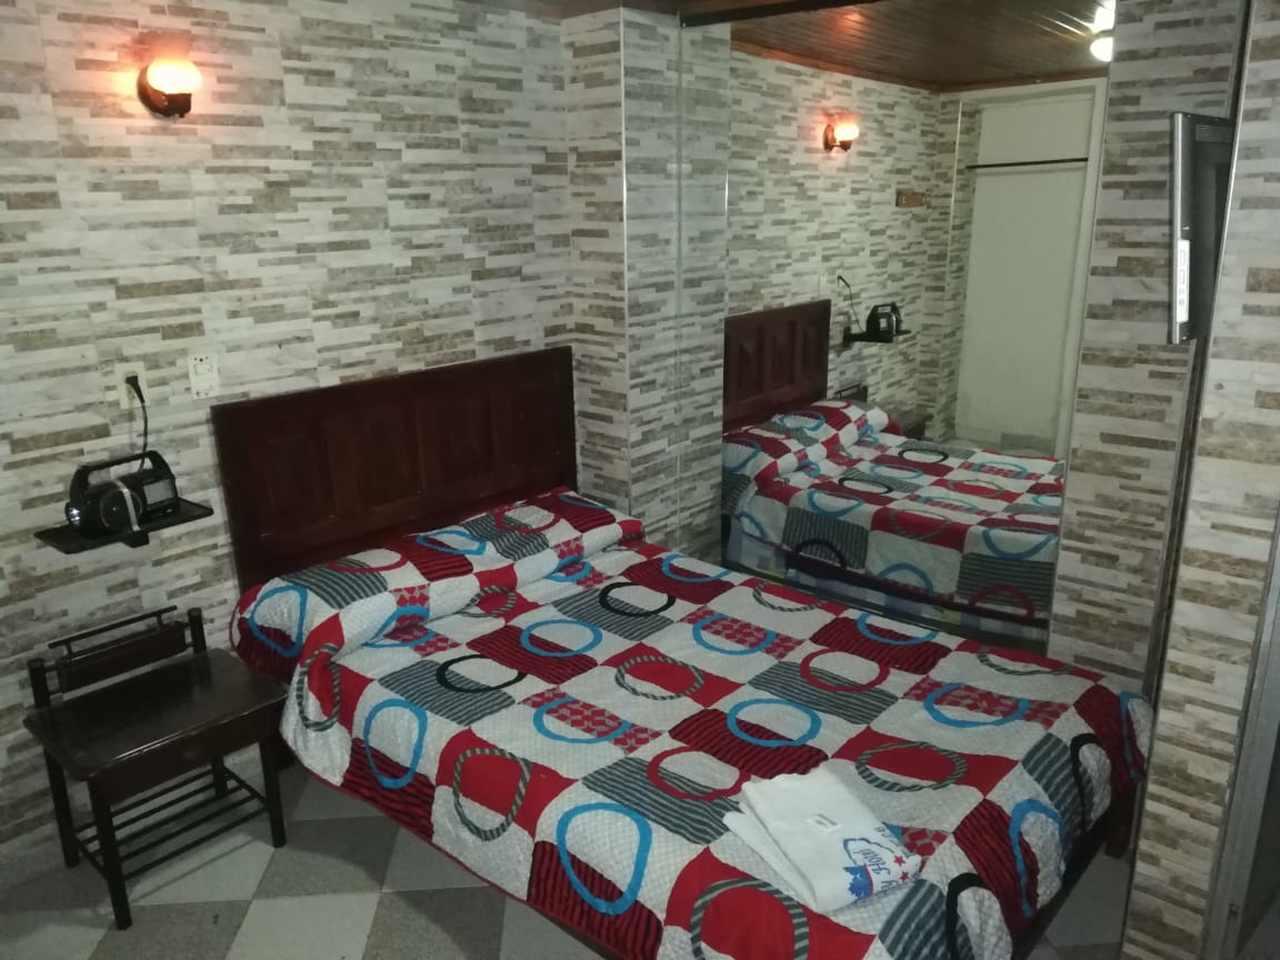 Napoly en Centro - La Candelaria : MotelNow